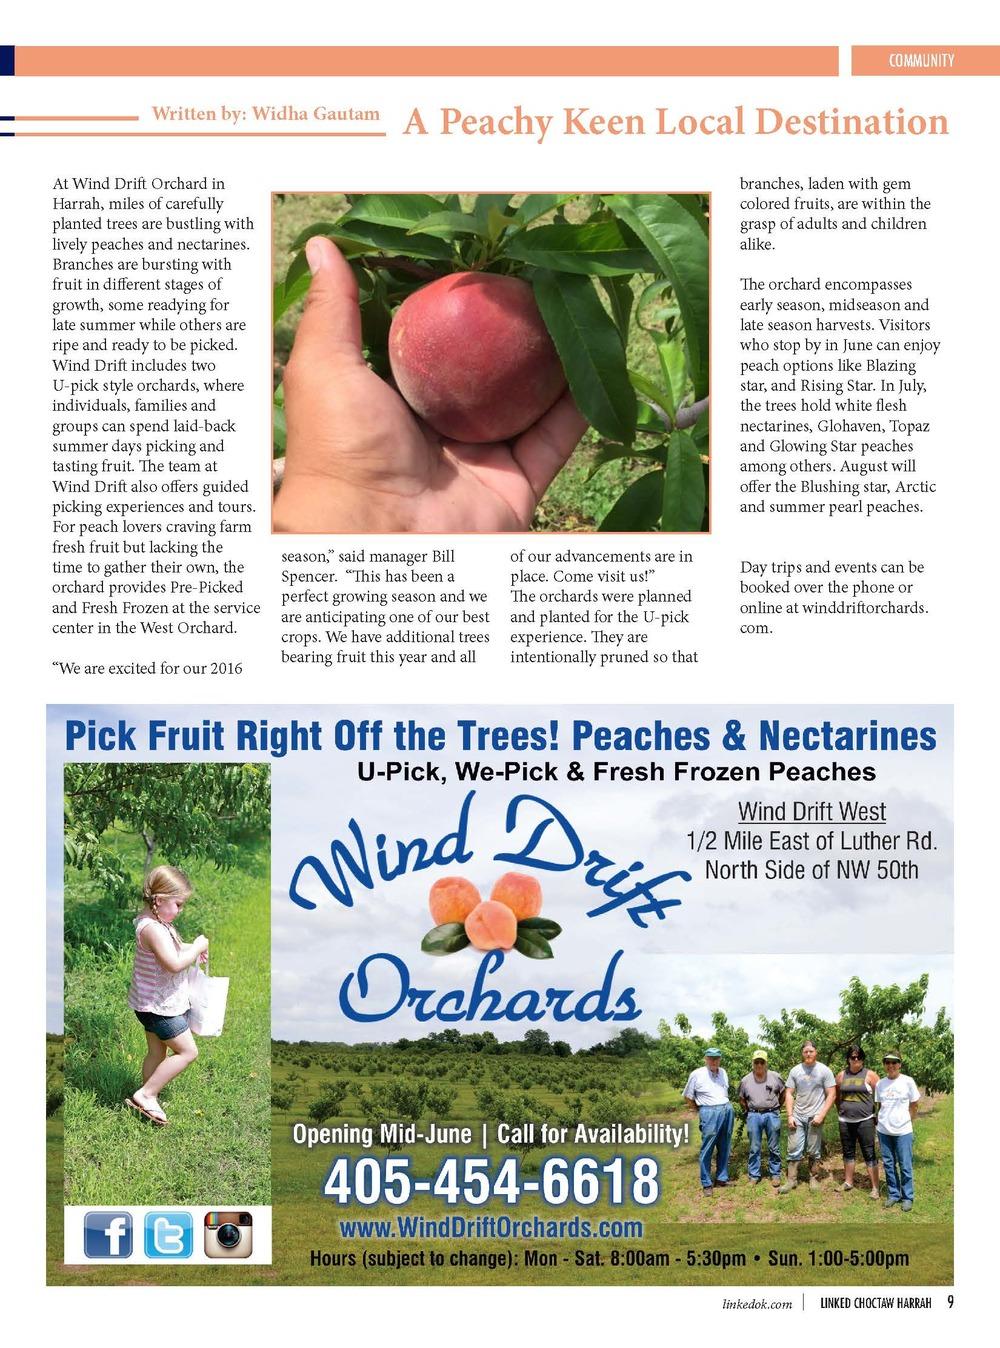 HighFive_ChoctawHarrah_June 2016 REVISED_Page_09.jpg